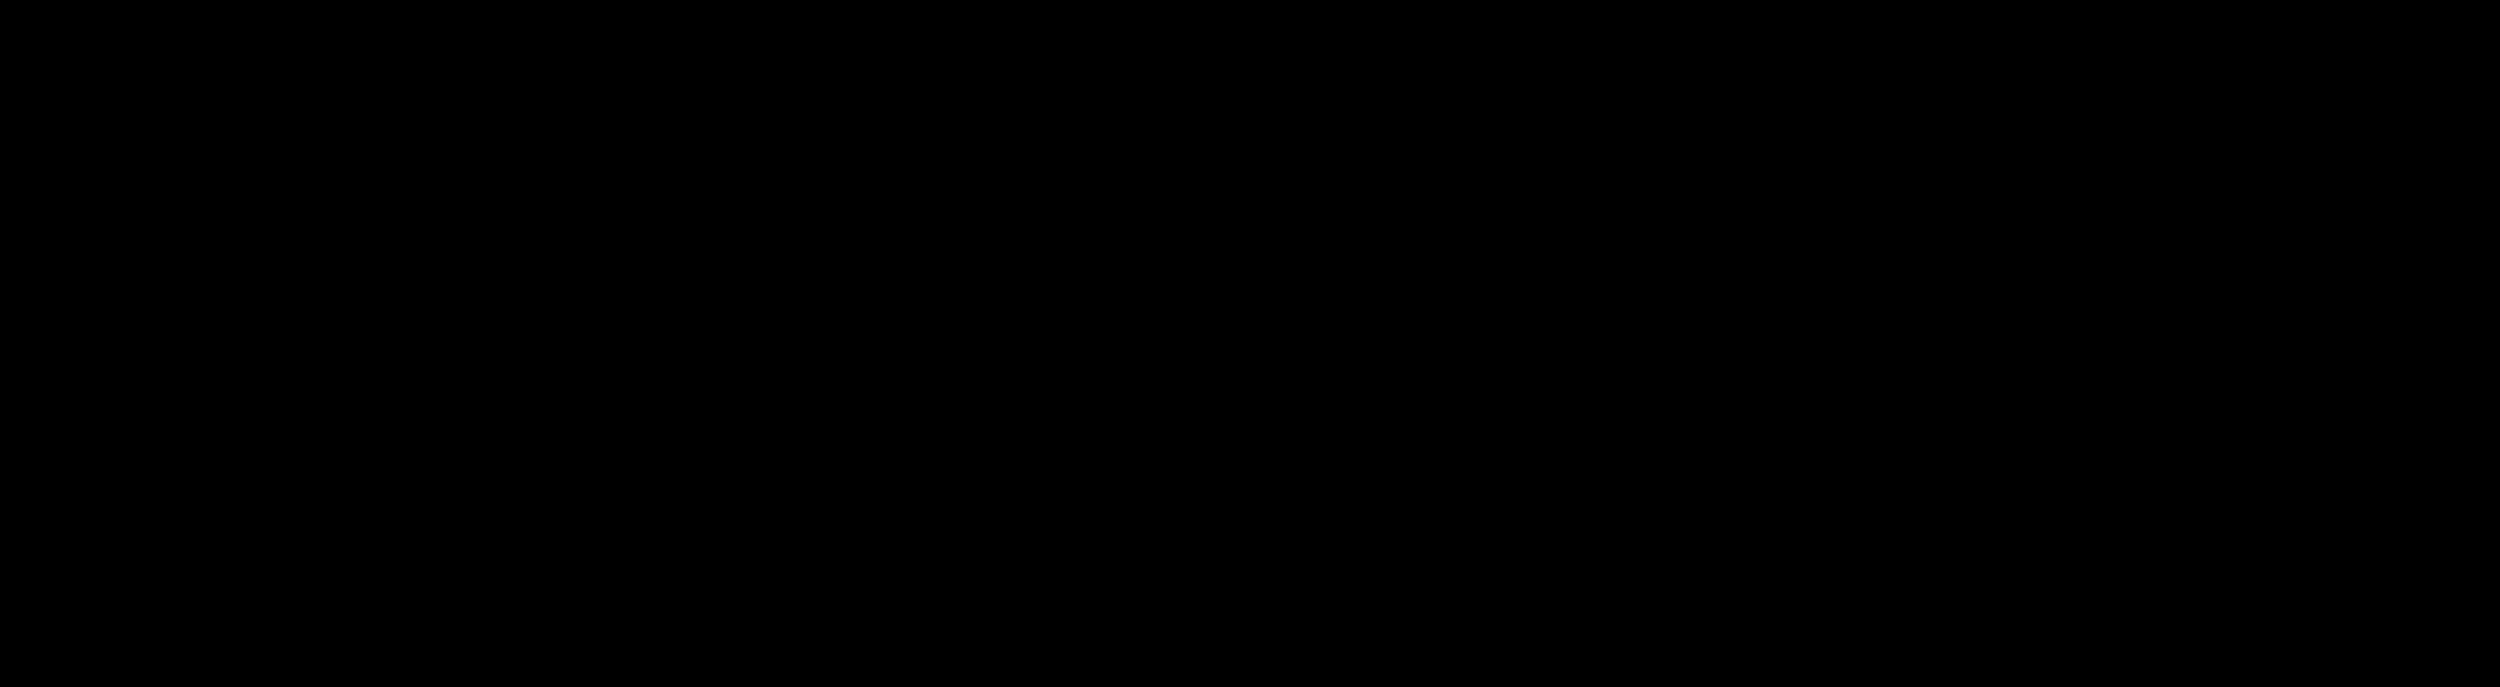 misspap-logo-01.png